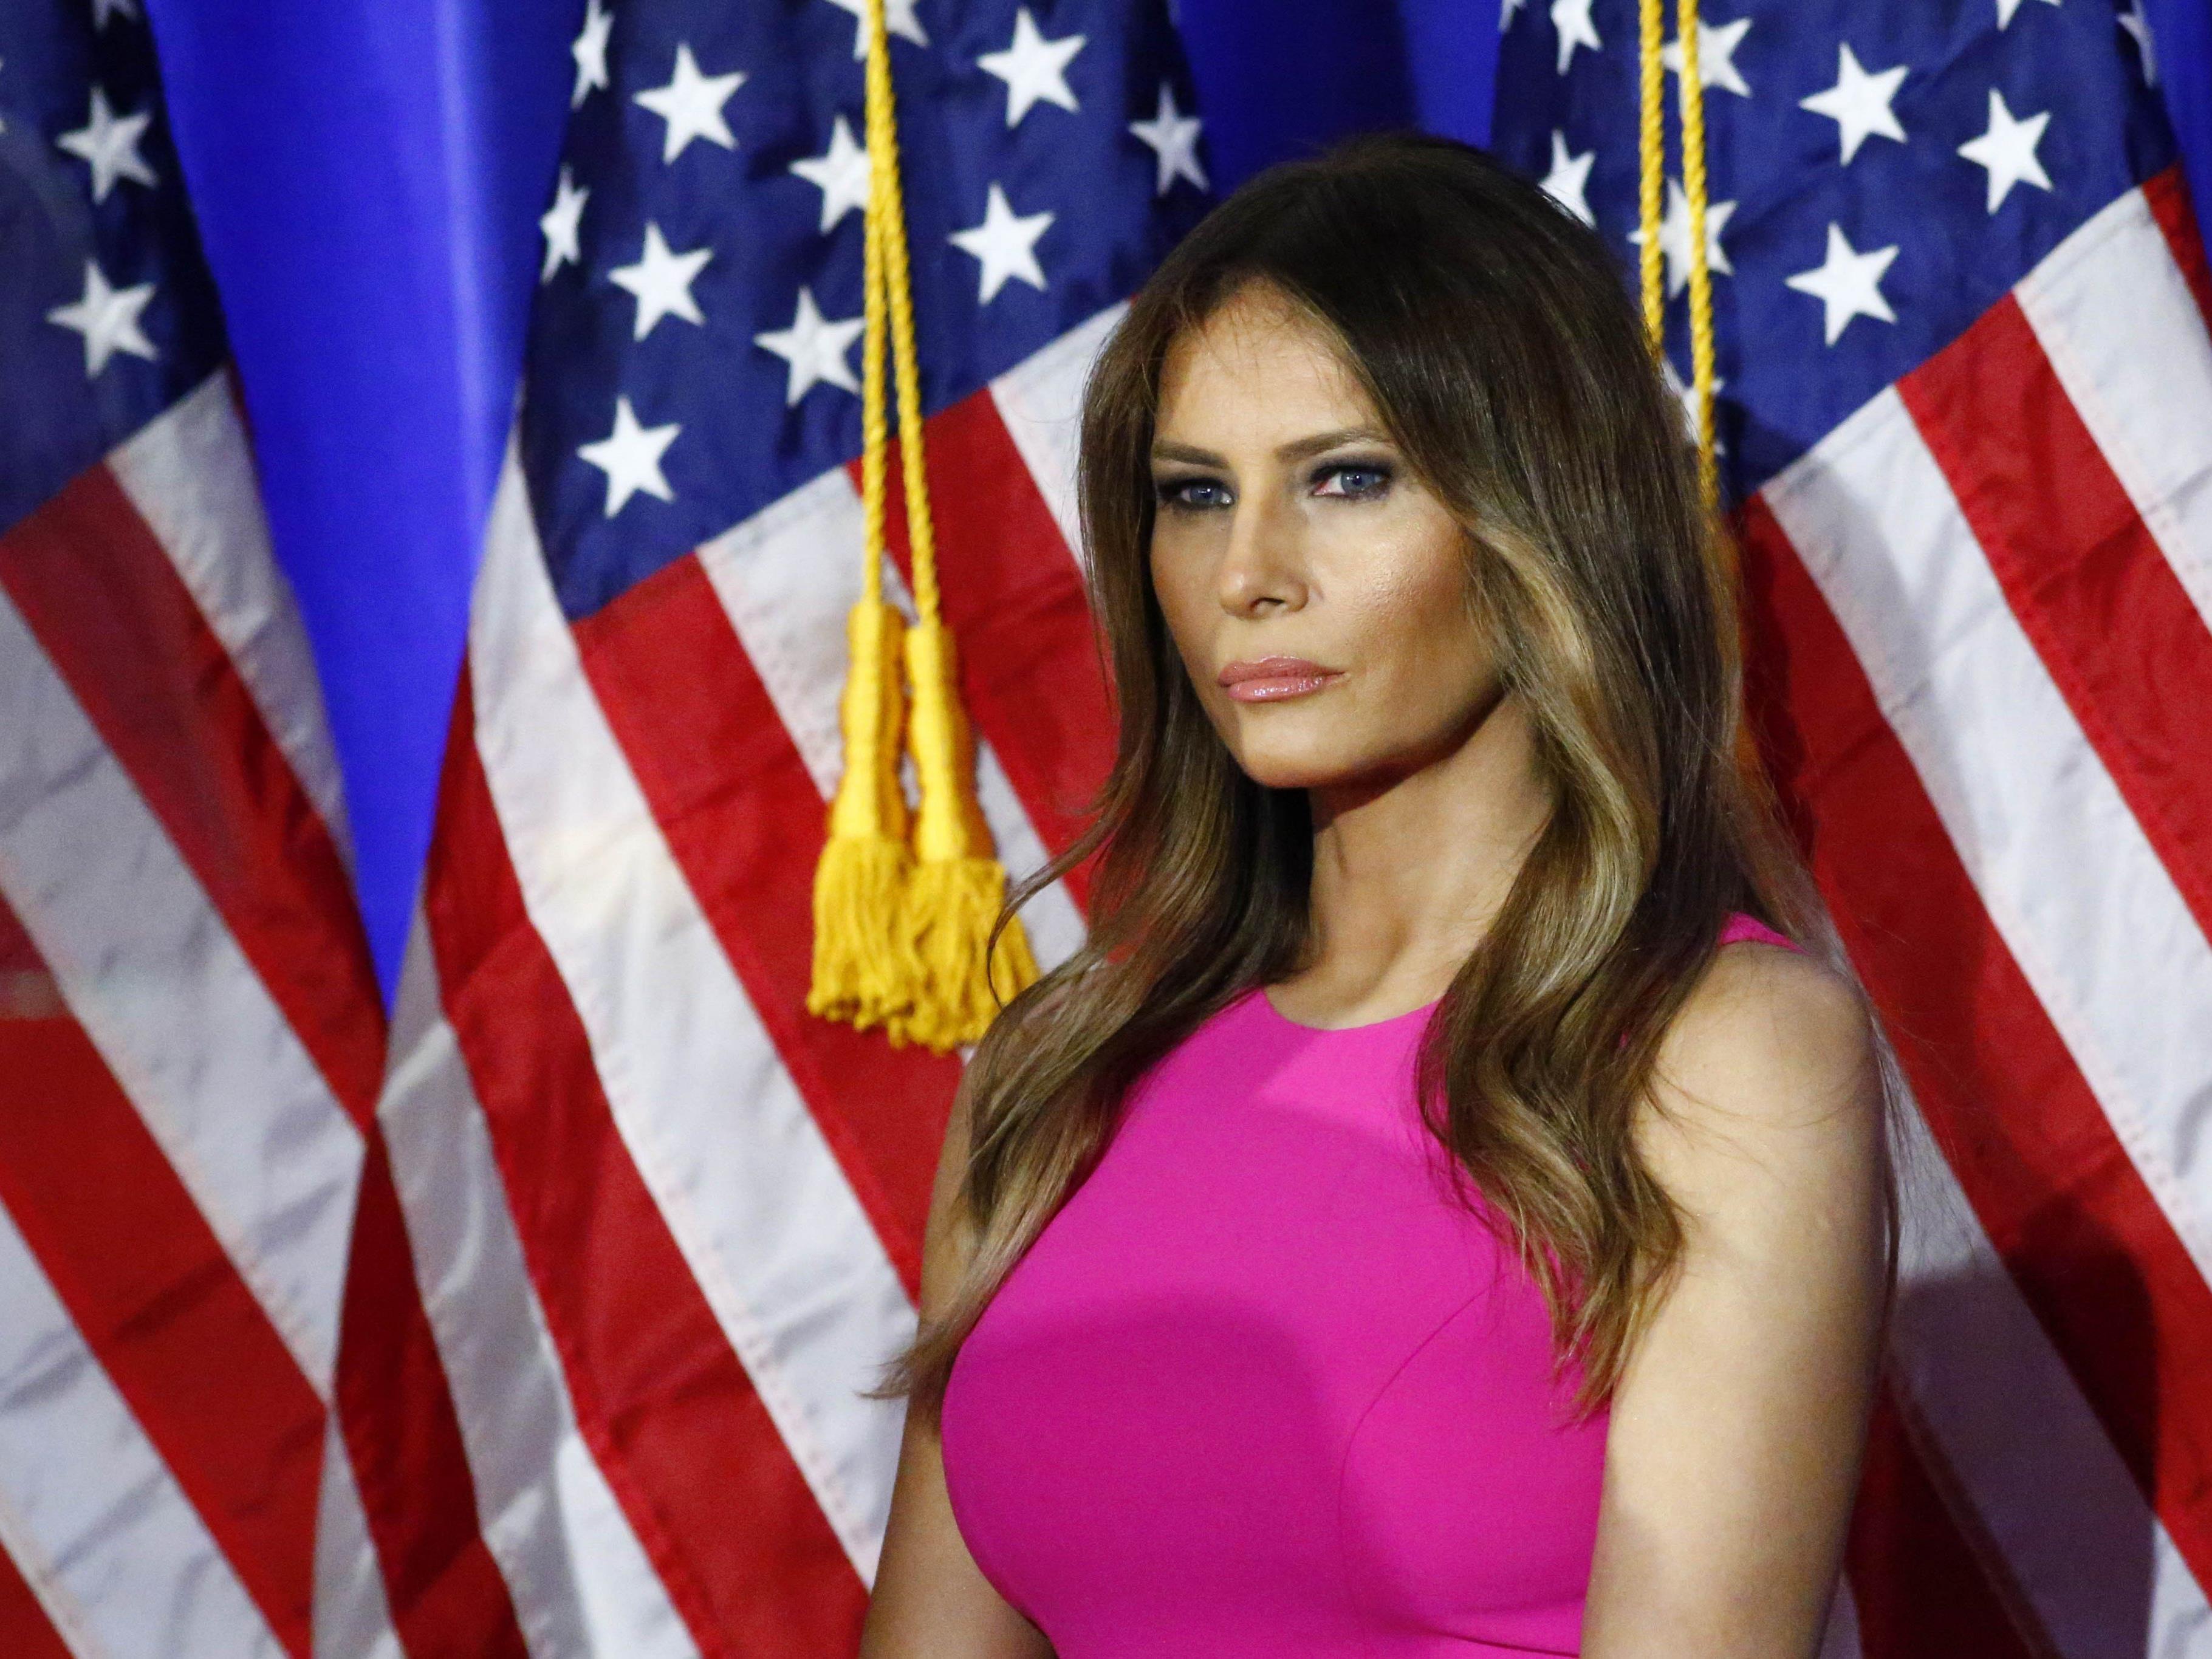 Melania Trump verklagt mehrere Medien.